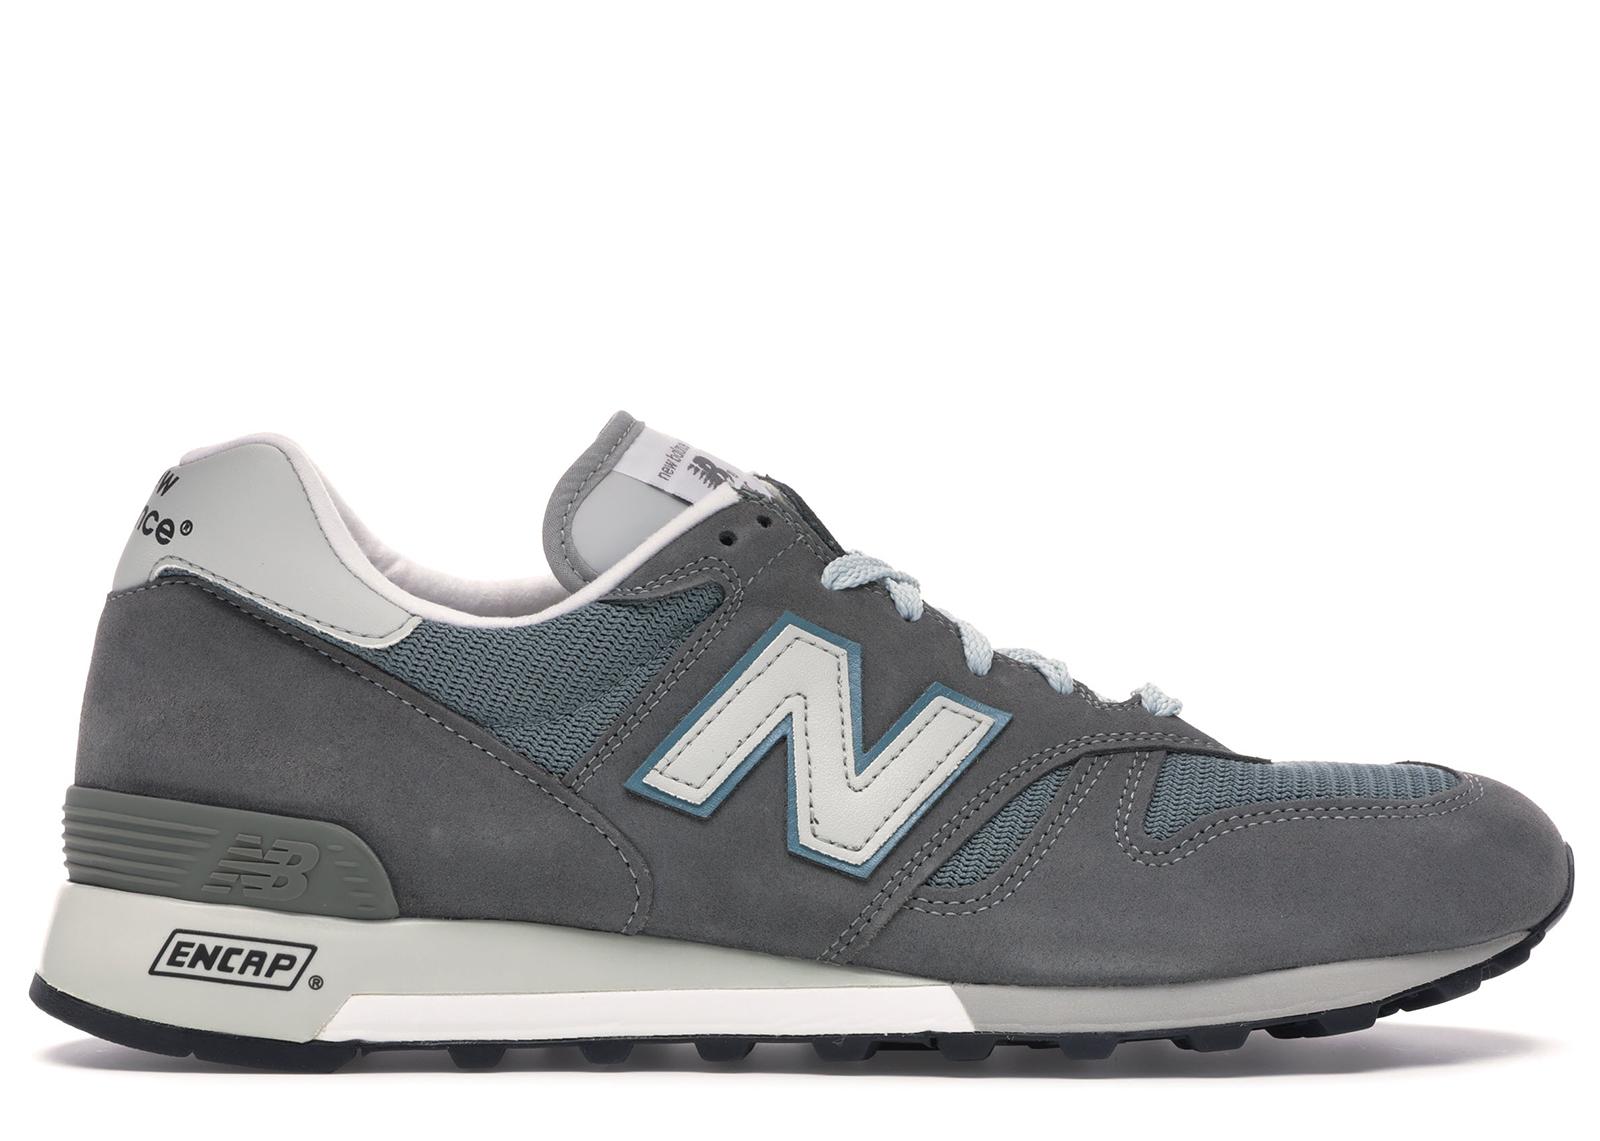 New Balance 1300 Steel Blue - M1300CL/M1300CLS